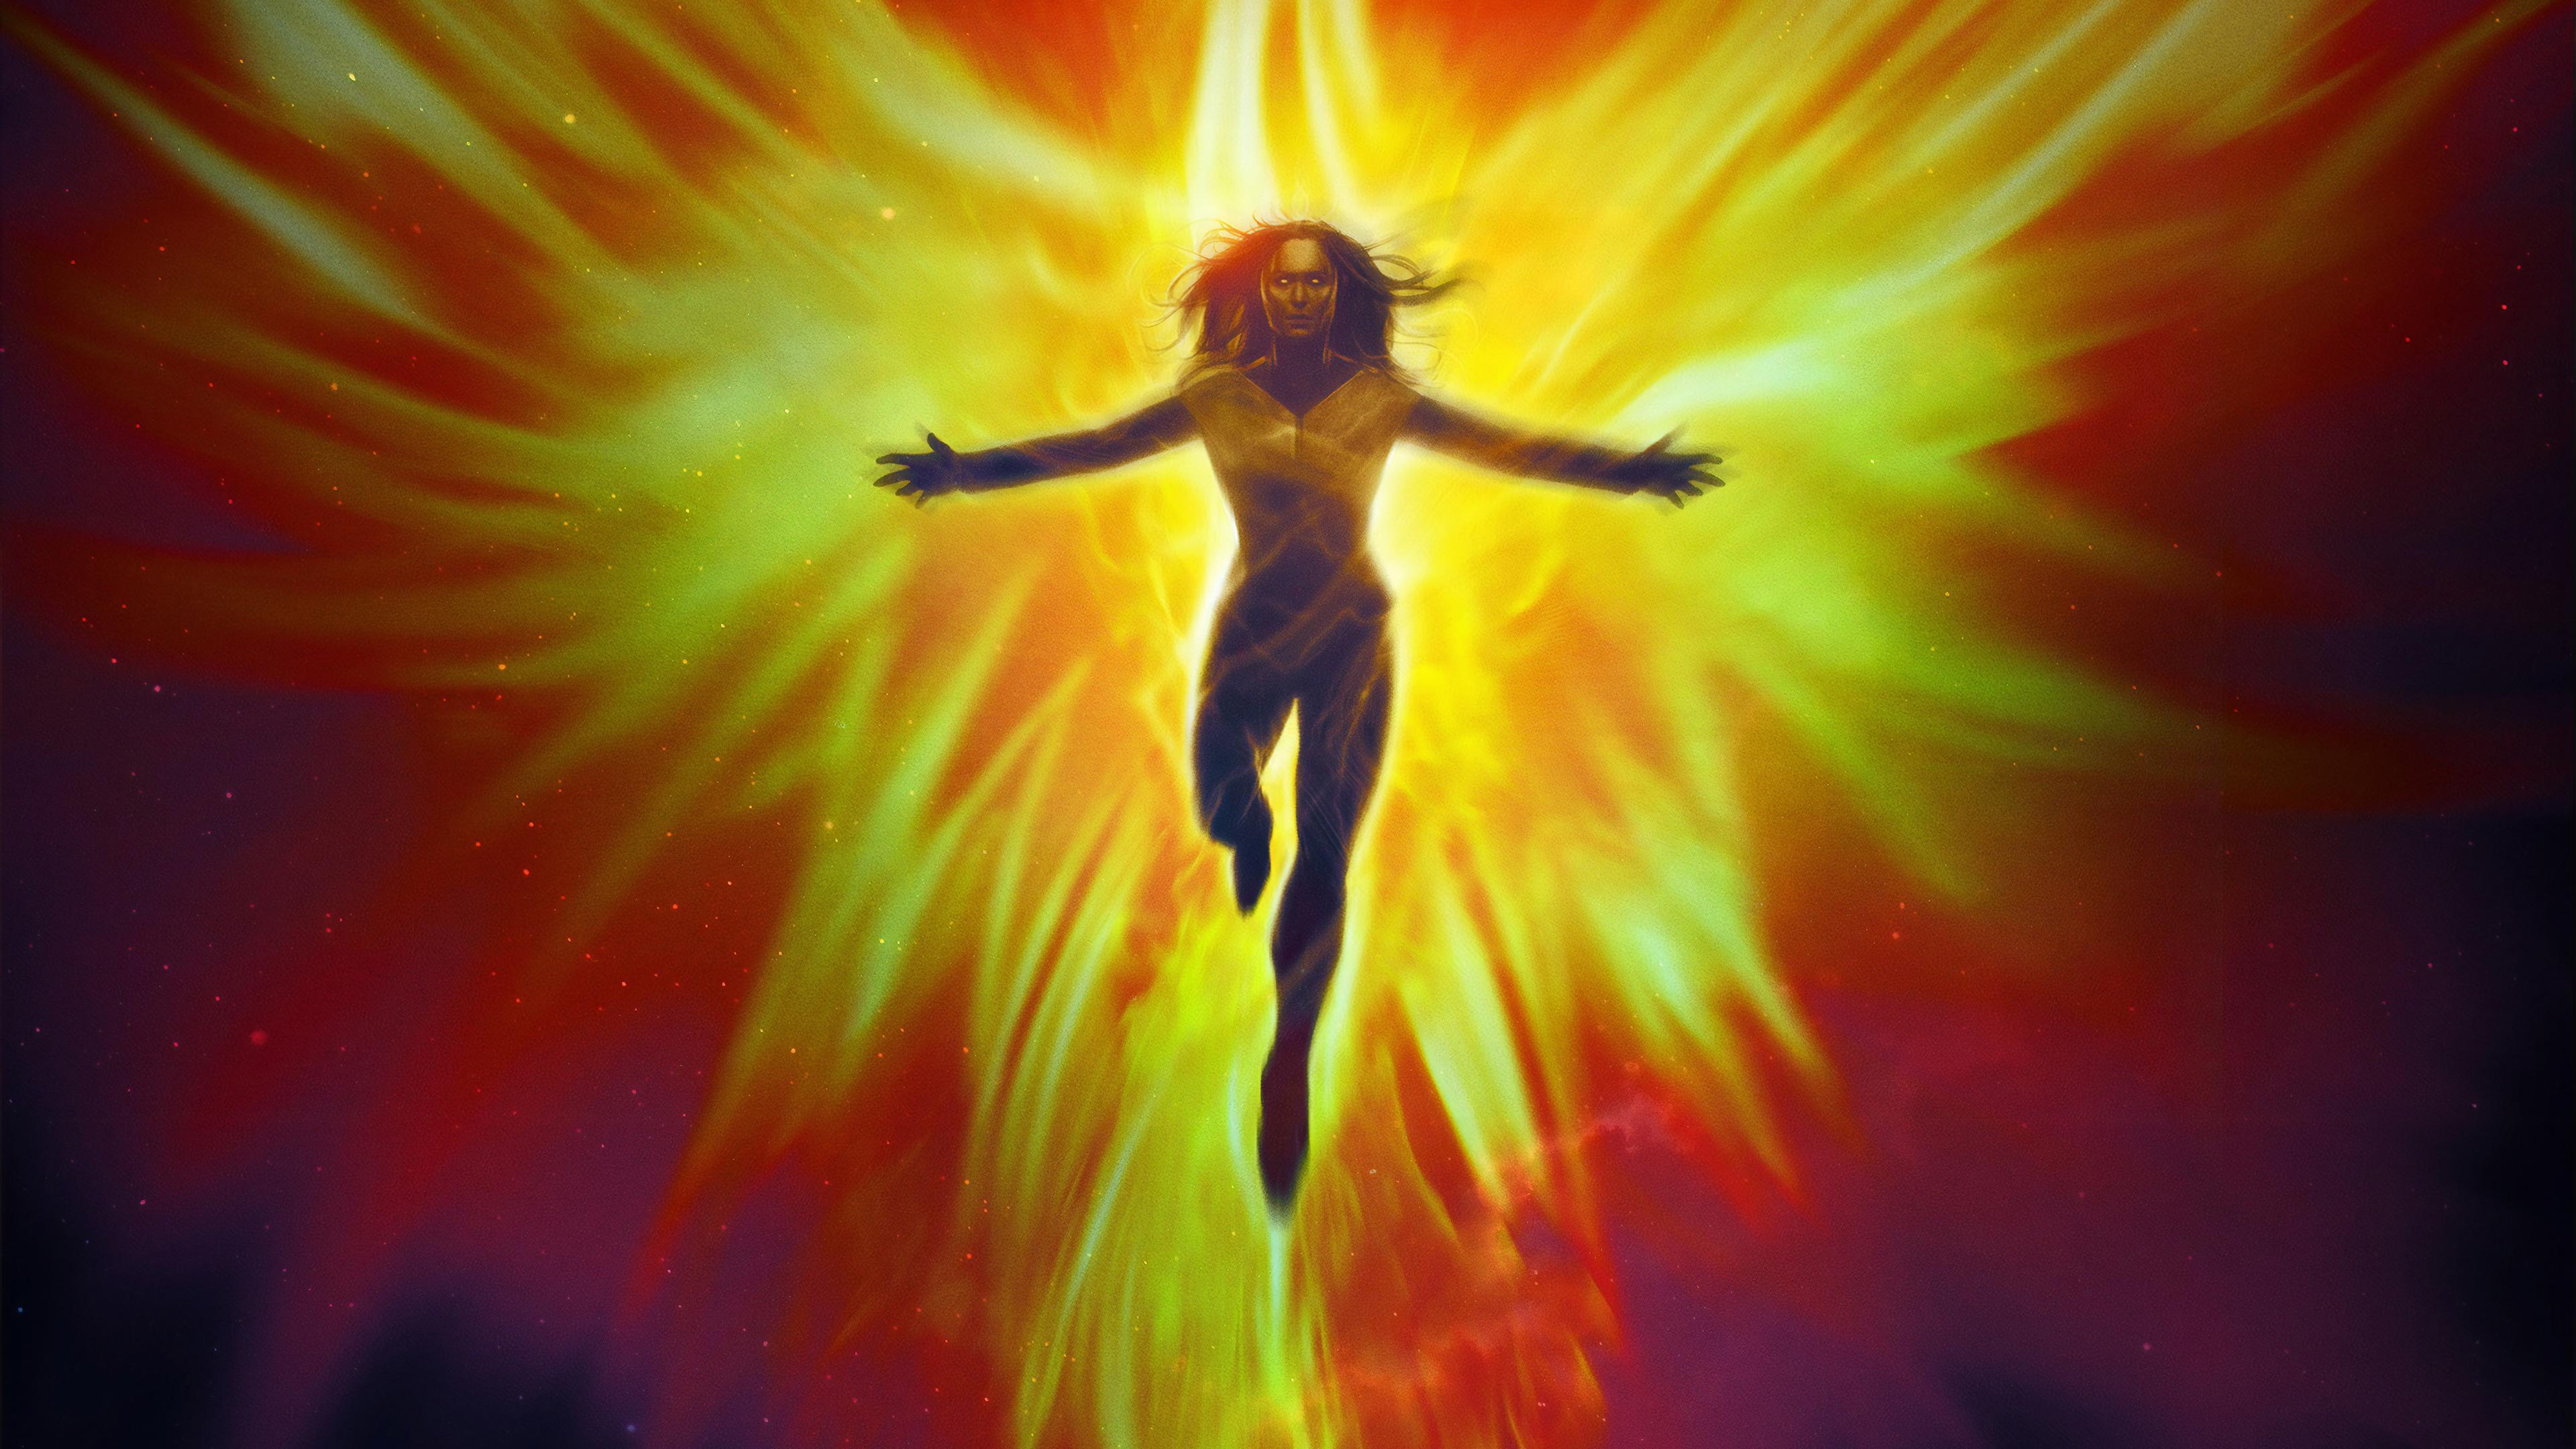 x men dark phoenix fan art 4k 1560535103 - X Men Dark Phoenix Fan Art 4k - x men dark phoenix wallpapers, poster wallpapers, movies wallpapers, jean grey wallpapers, hd-wallpapers, behance wallpapers, 4k-wallpapers, 2019 movies wallpapers